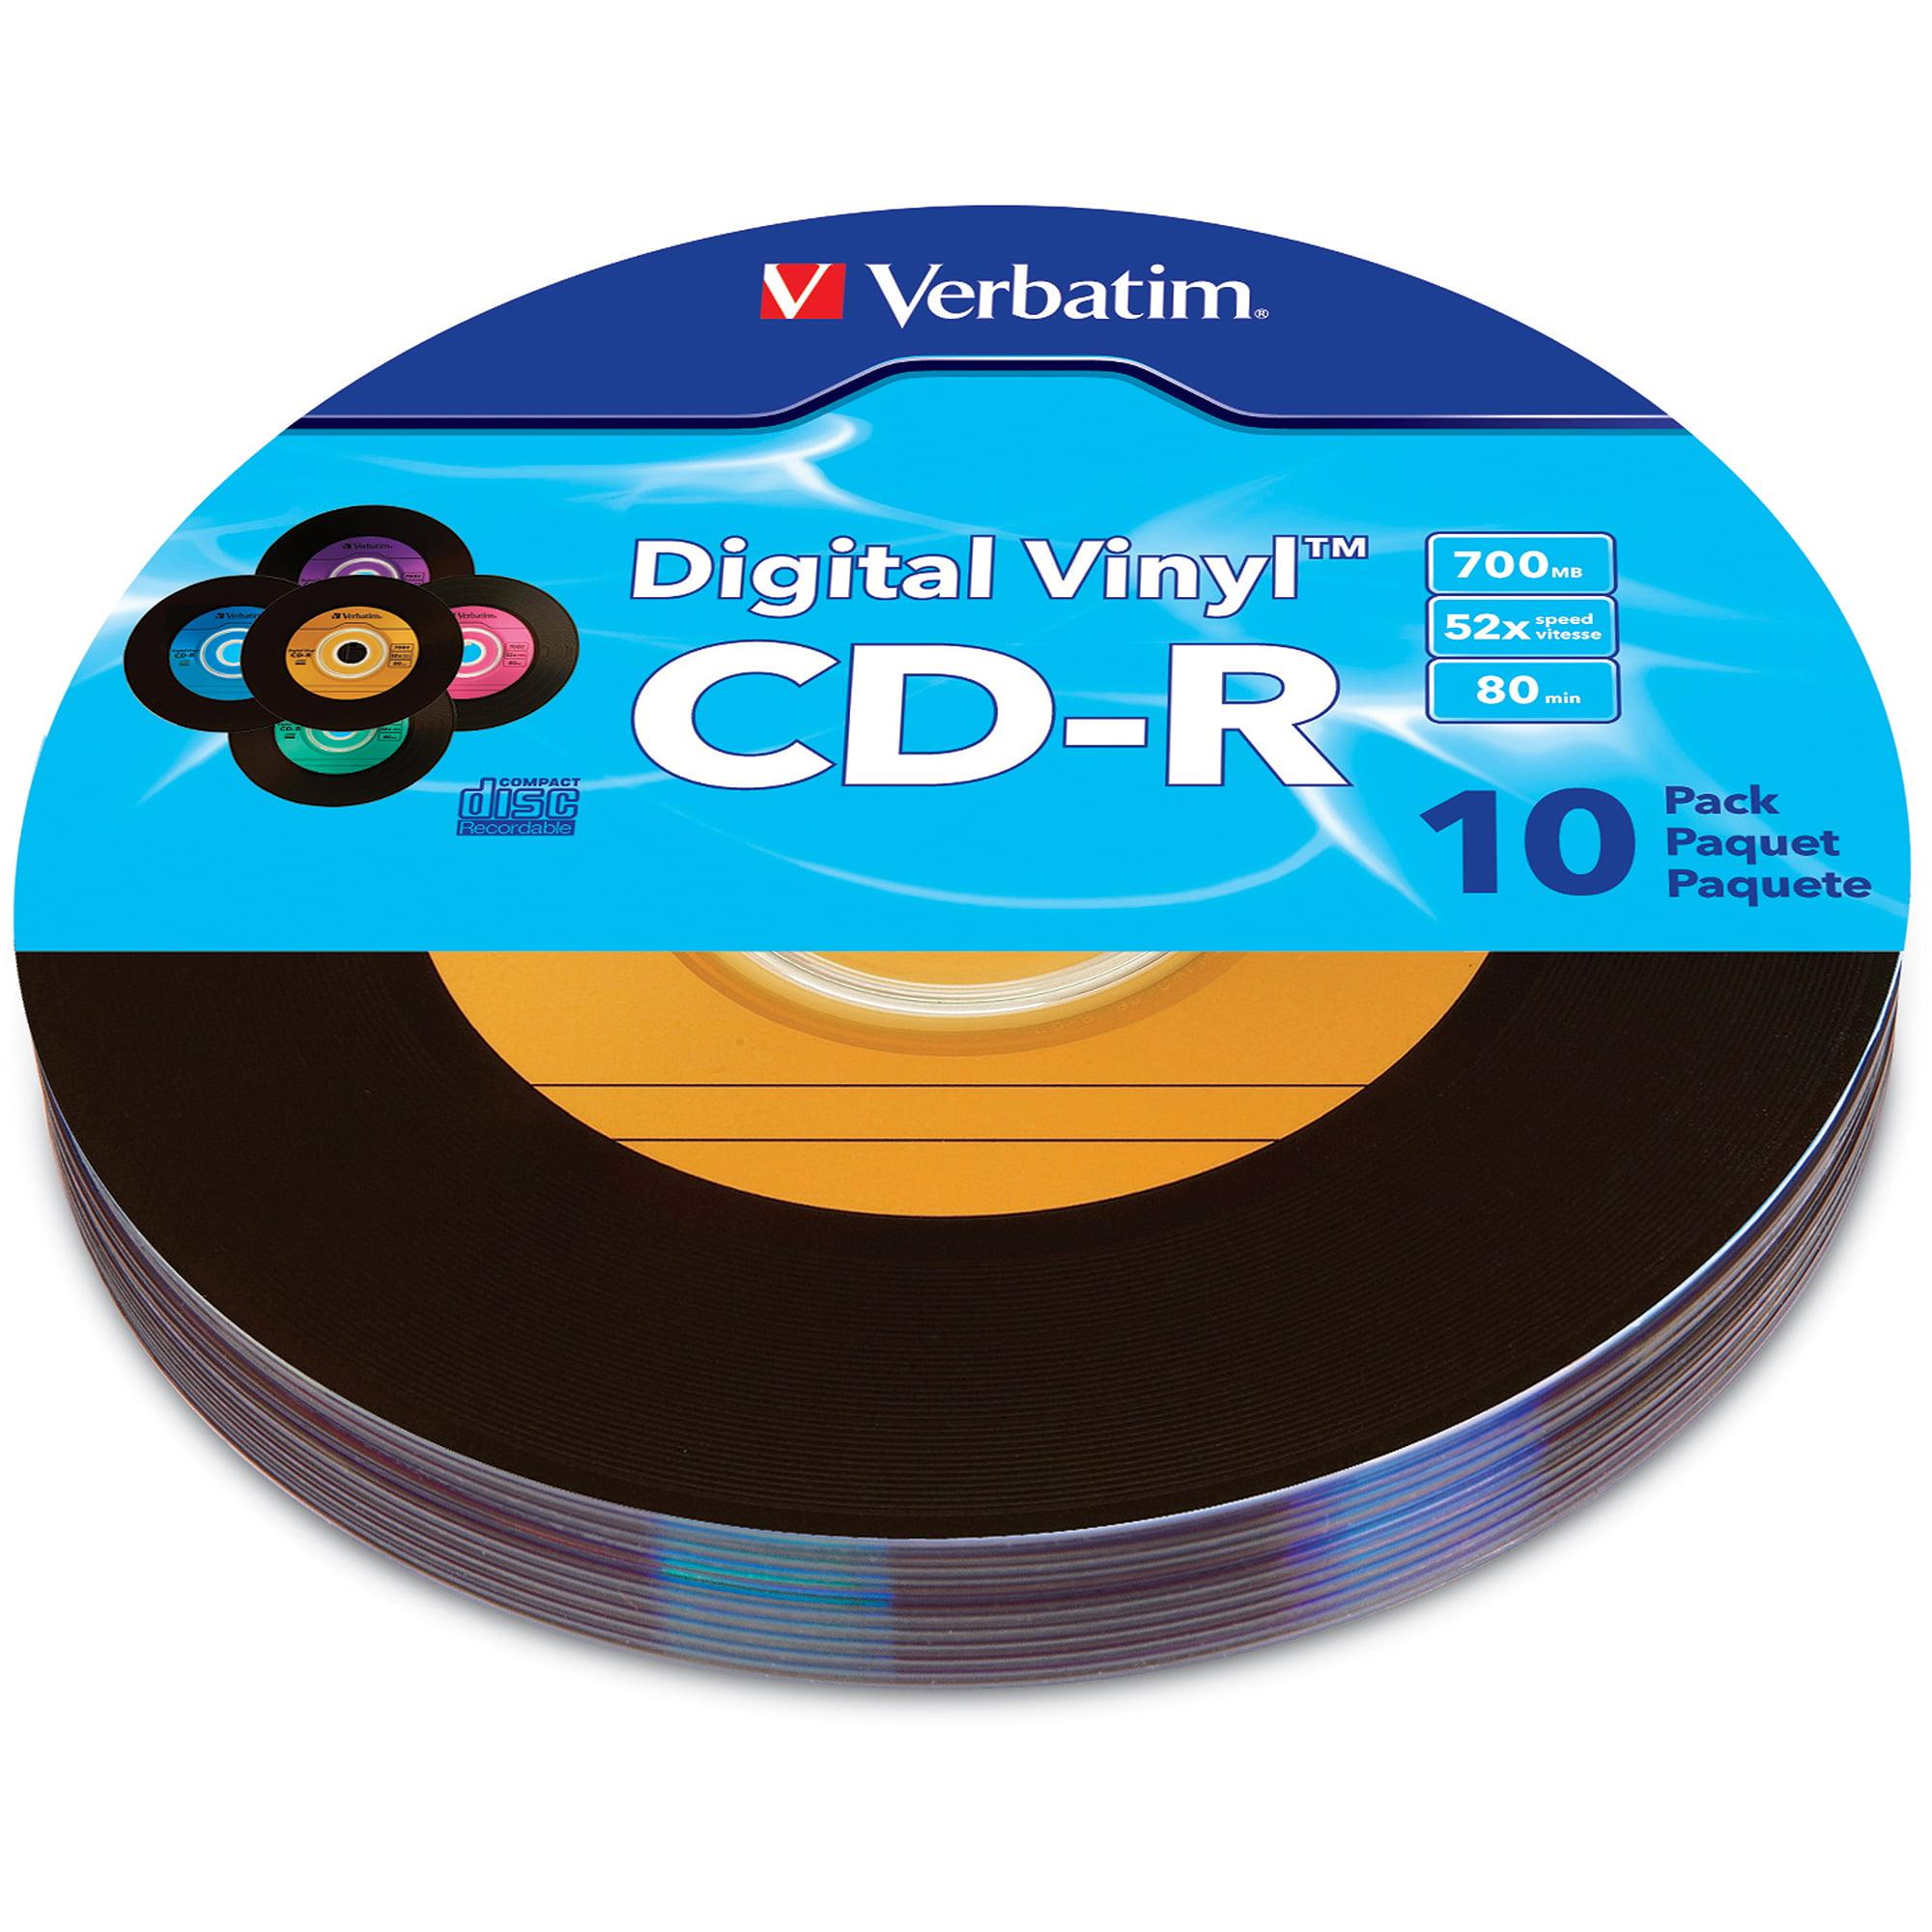 Verbatim Digital Vinyl 80-Min/700MB CD-R, 10pk